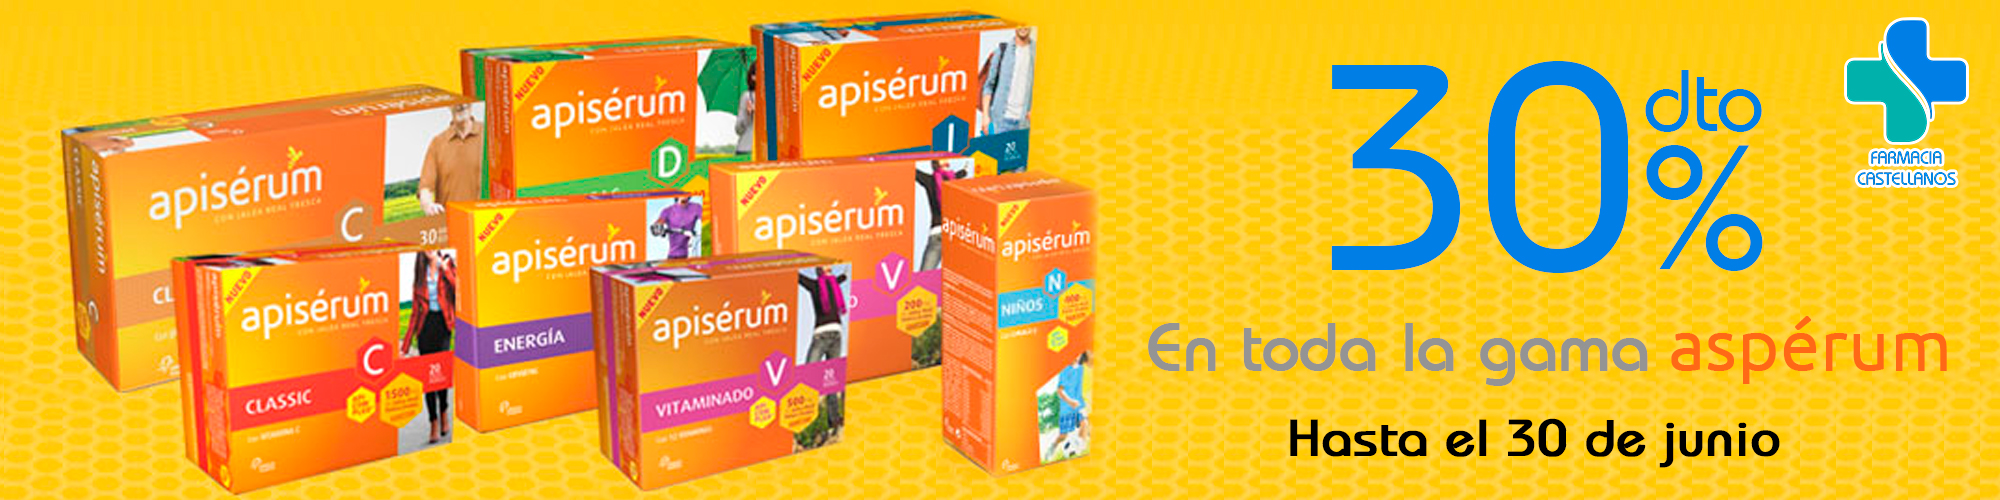 descuento-aspiserum-farmaciabeatrizcastellanos